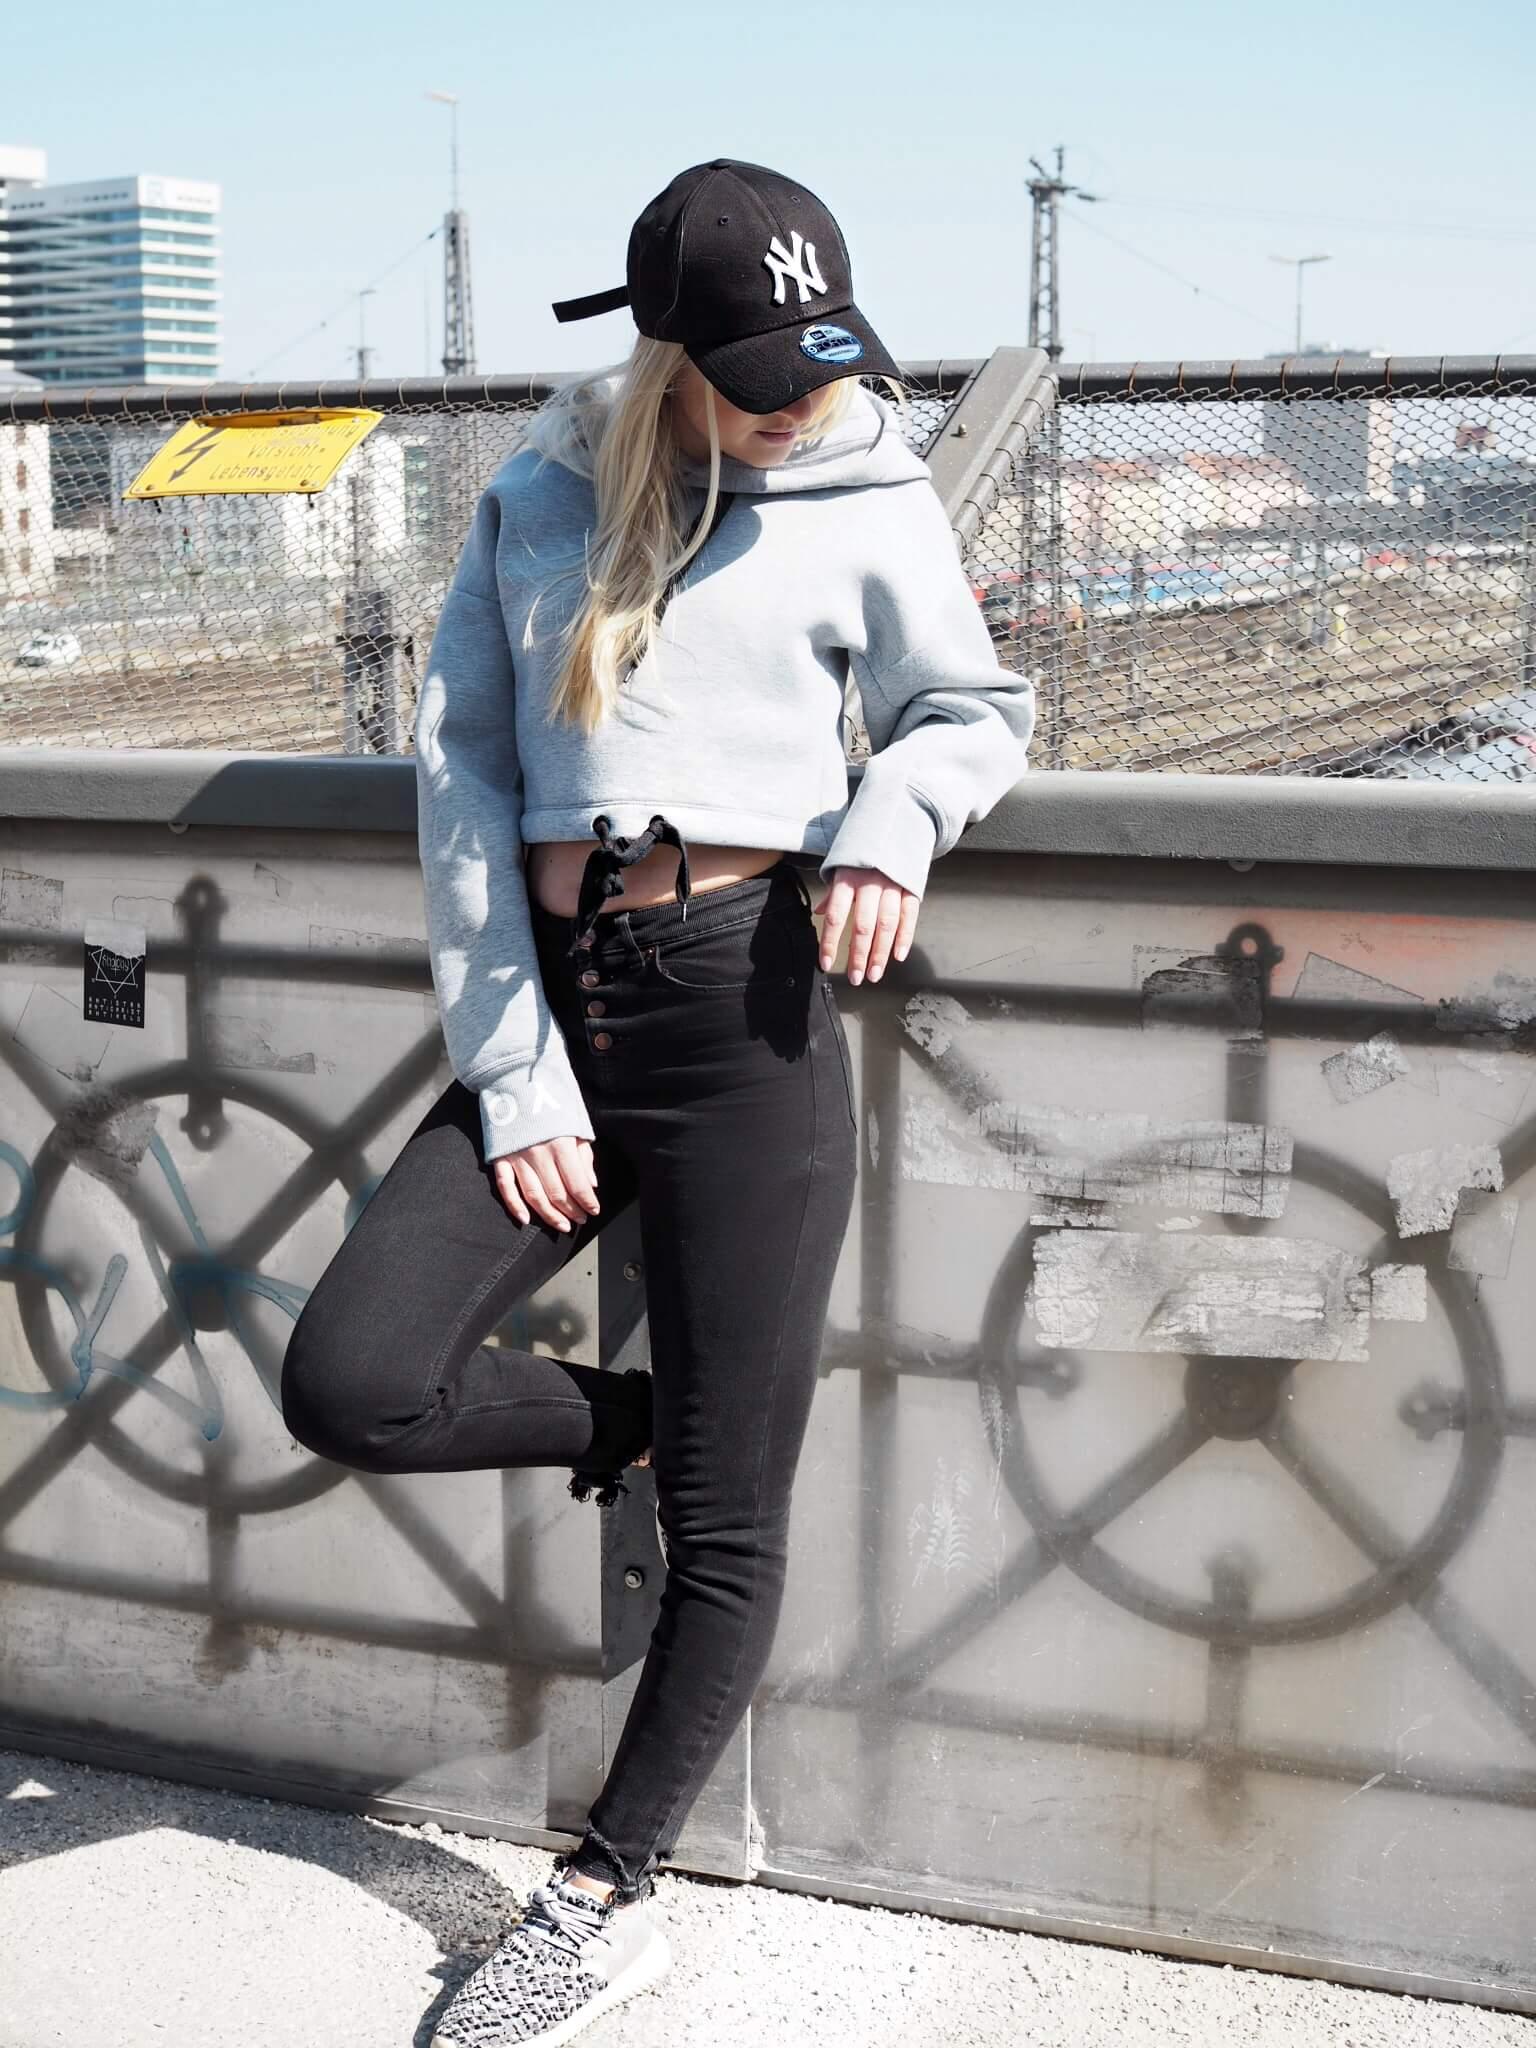 Streetwear Streetstyle Fashionblog Modeblog Katefully Hoodie Sneaker Cap ootd München Germany Style Fashion Bloggerin Streetfashion Katefully